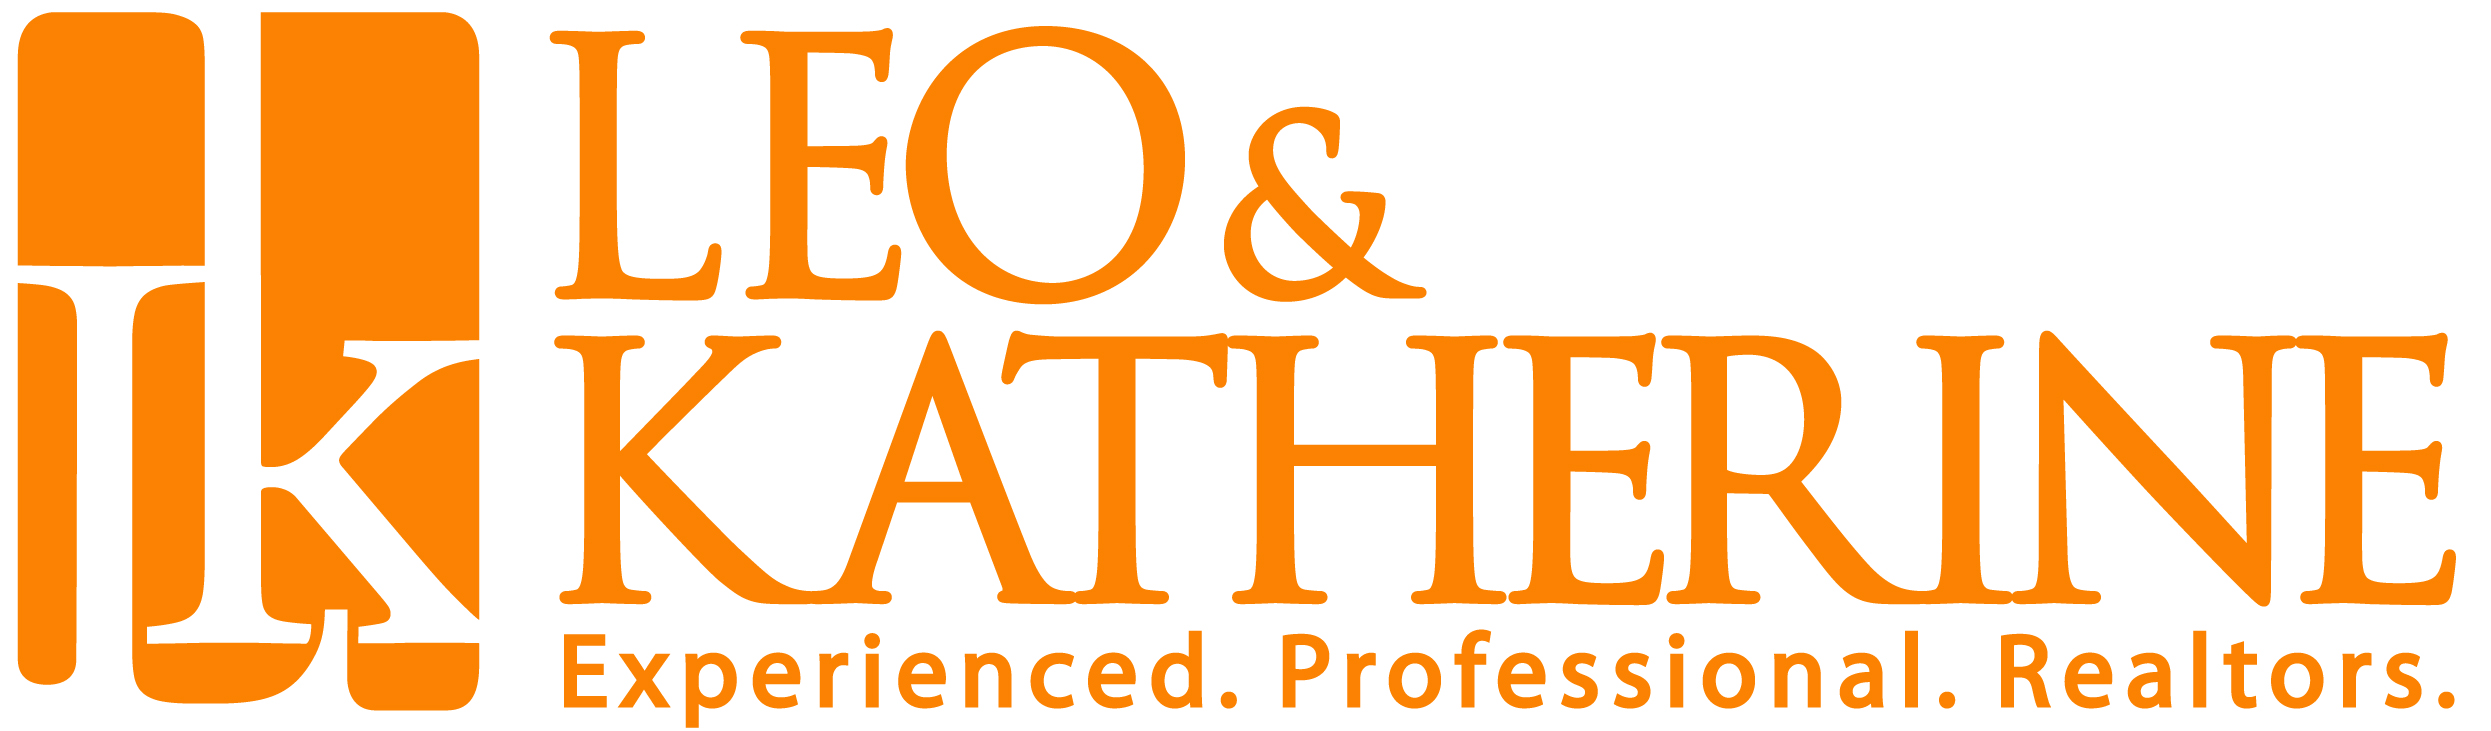 Leo & Katherine | LK & Associates REALTORS